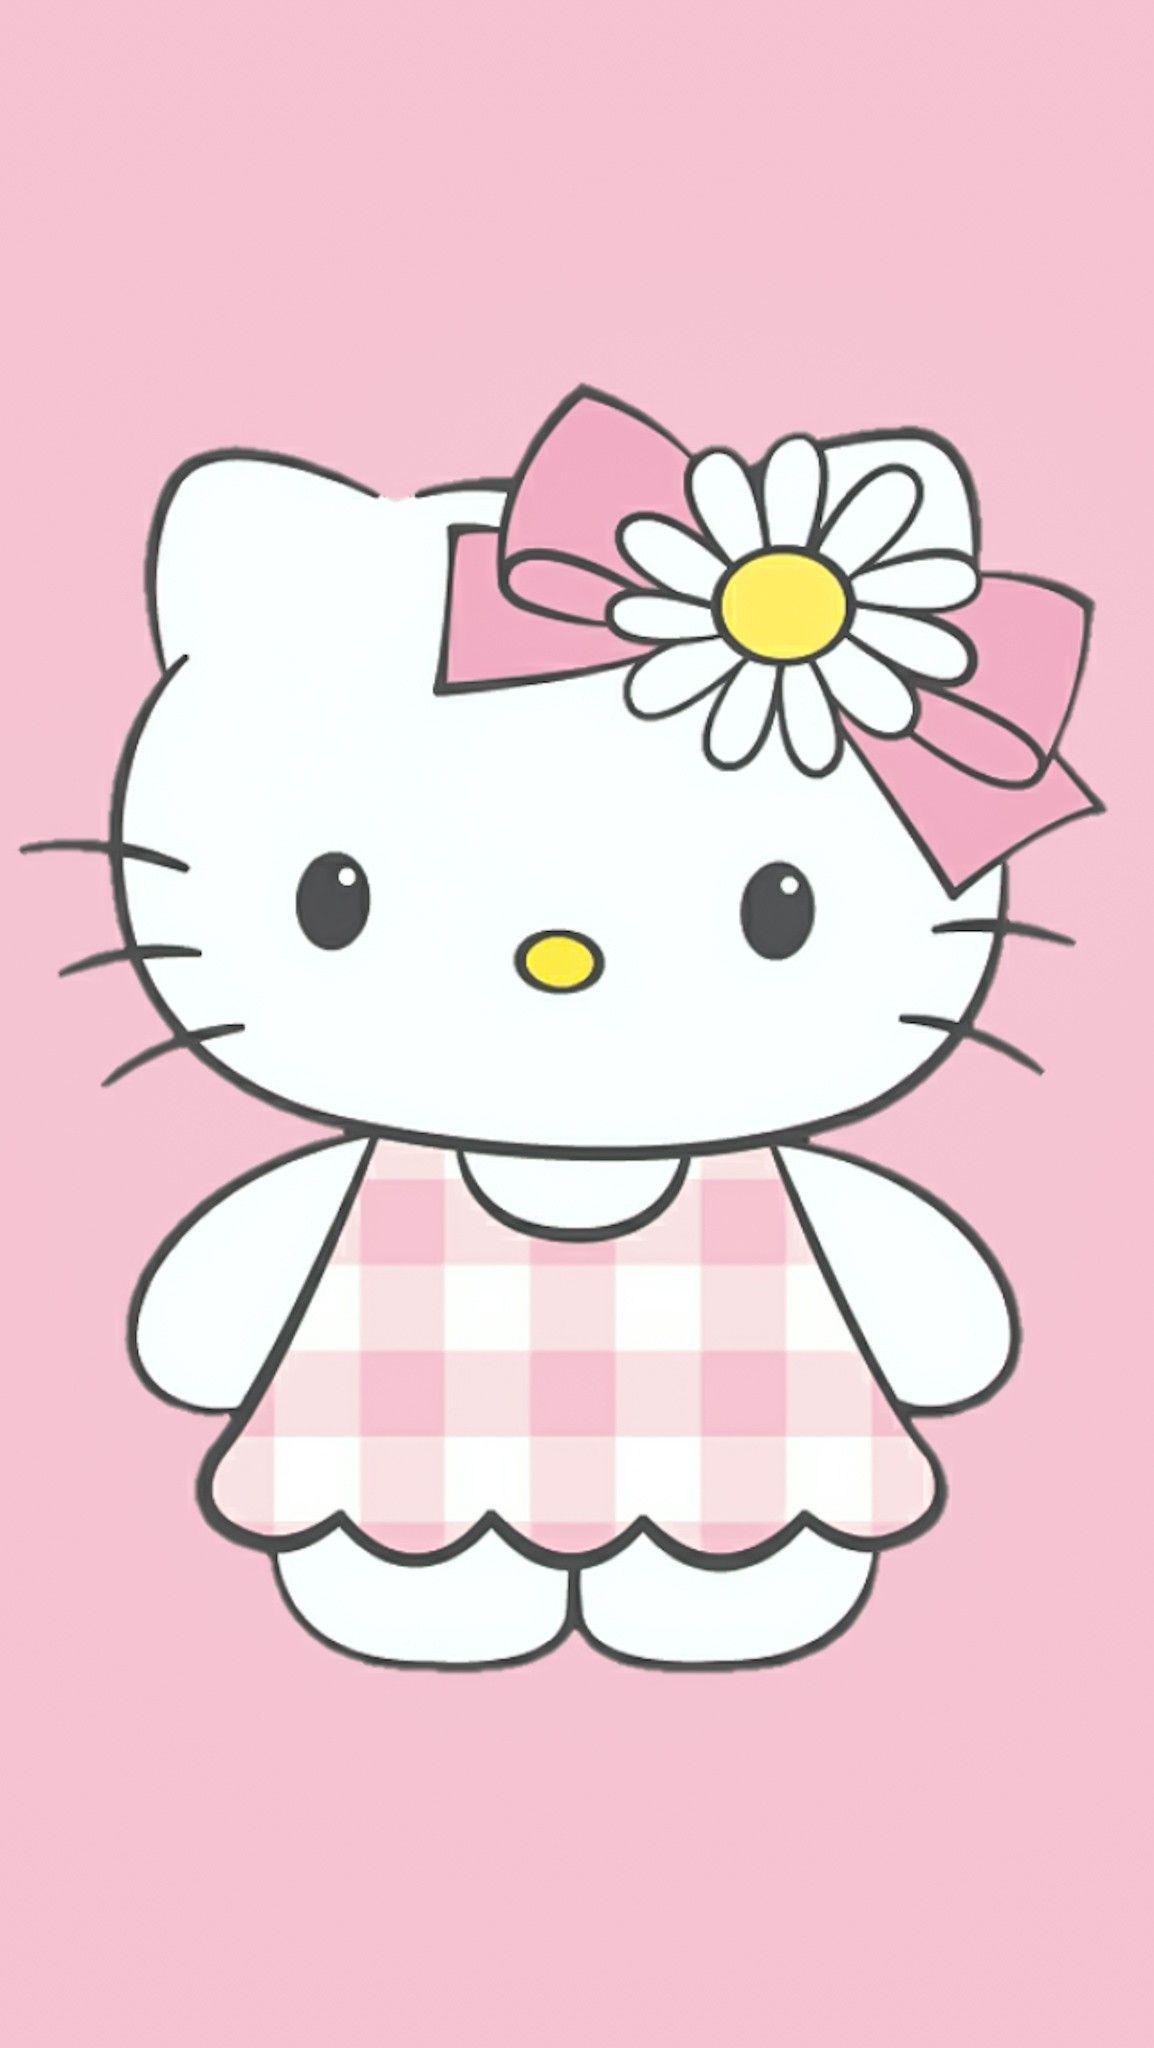 Pin By Aekkalisa On Hello Kitty Bg Hello Kitty Pictures Hello Kitty Wallpaper Hello Kitty Nails